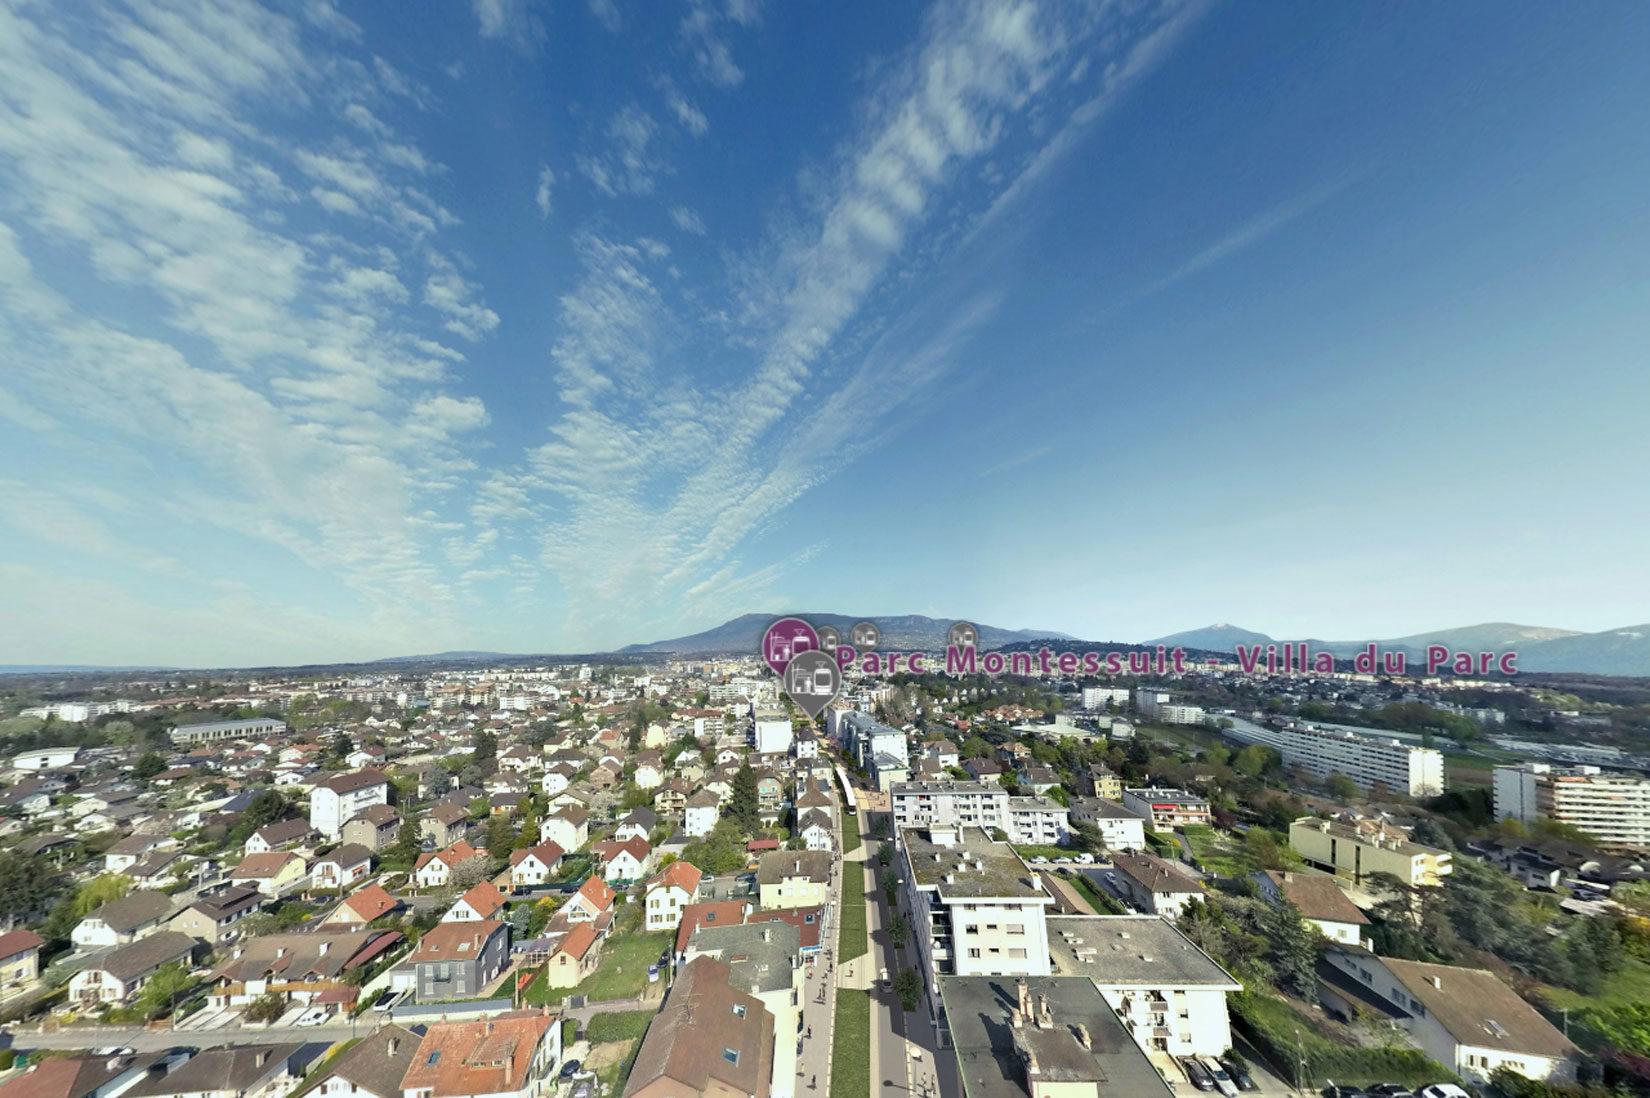 Tram Annemasse Geneve vues 3D